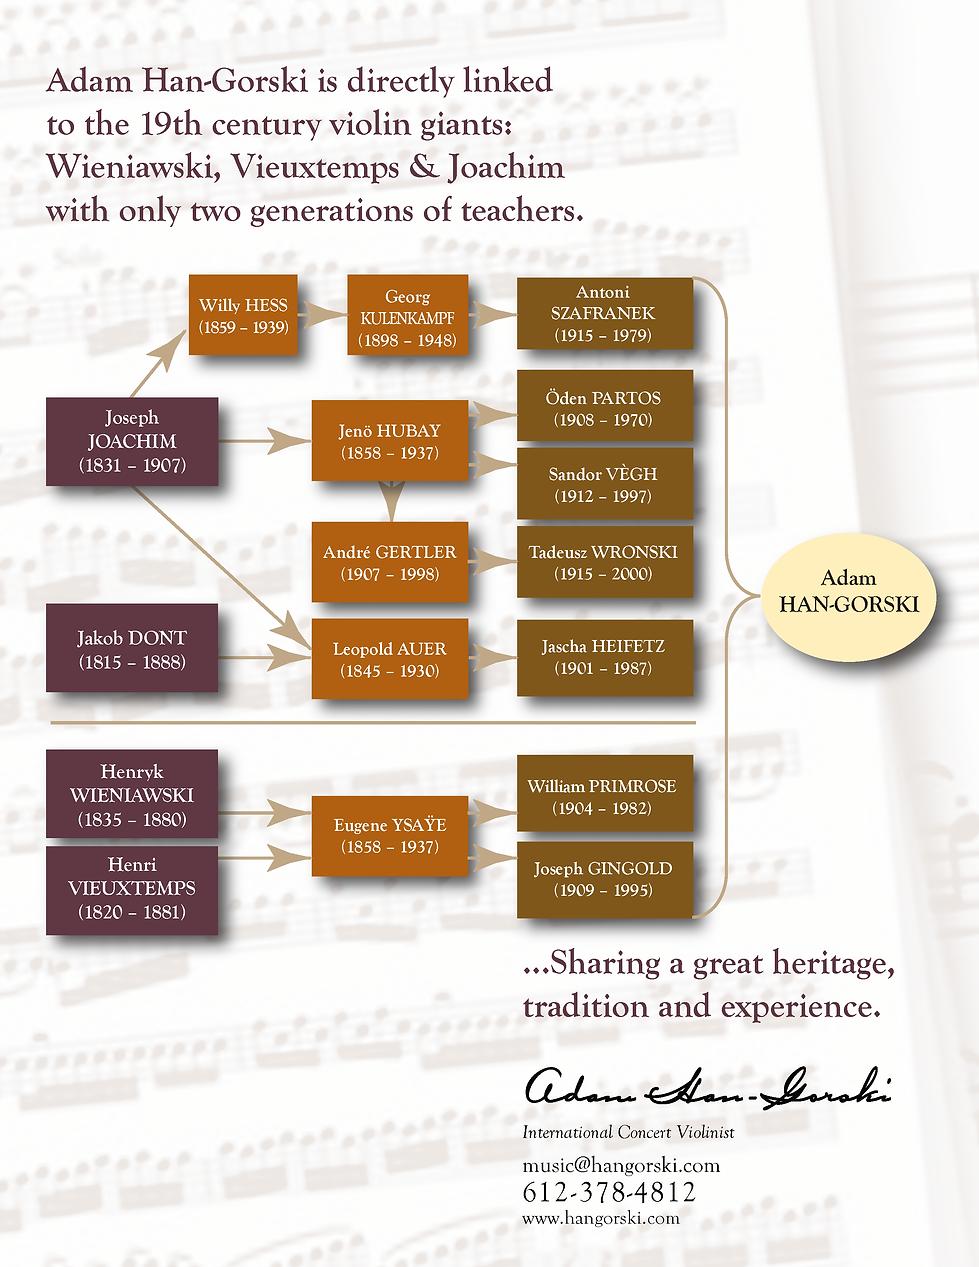 Han-Gorski Teachers linksto Violin Giant